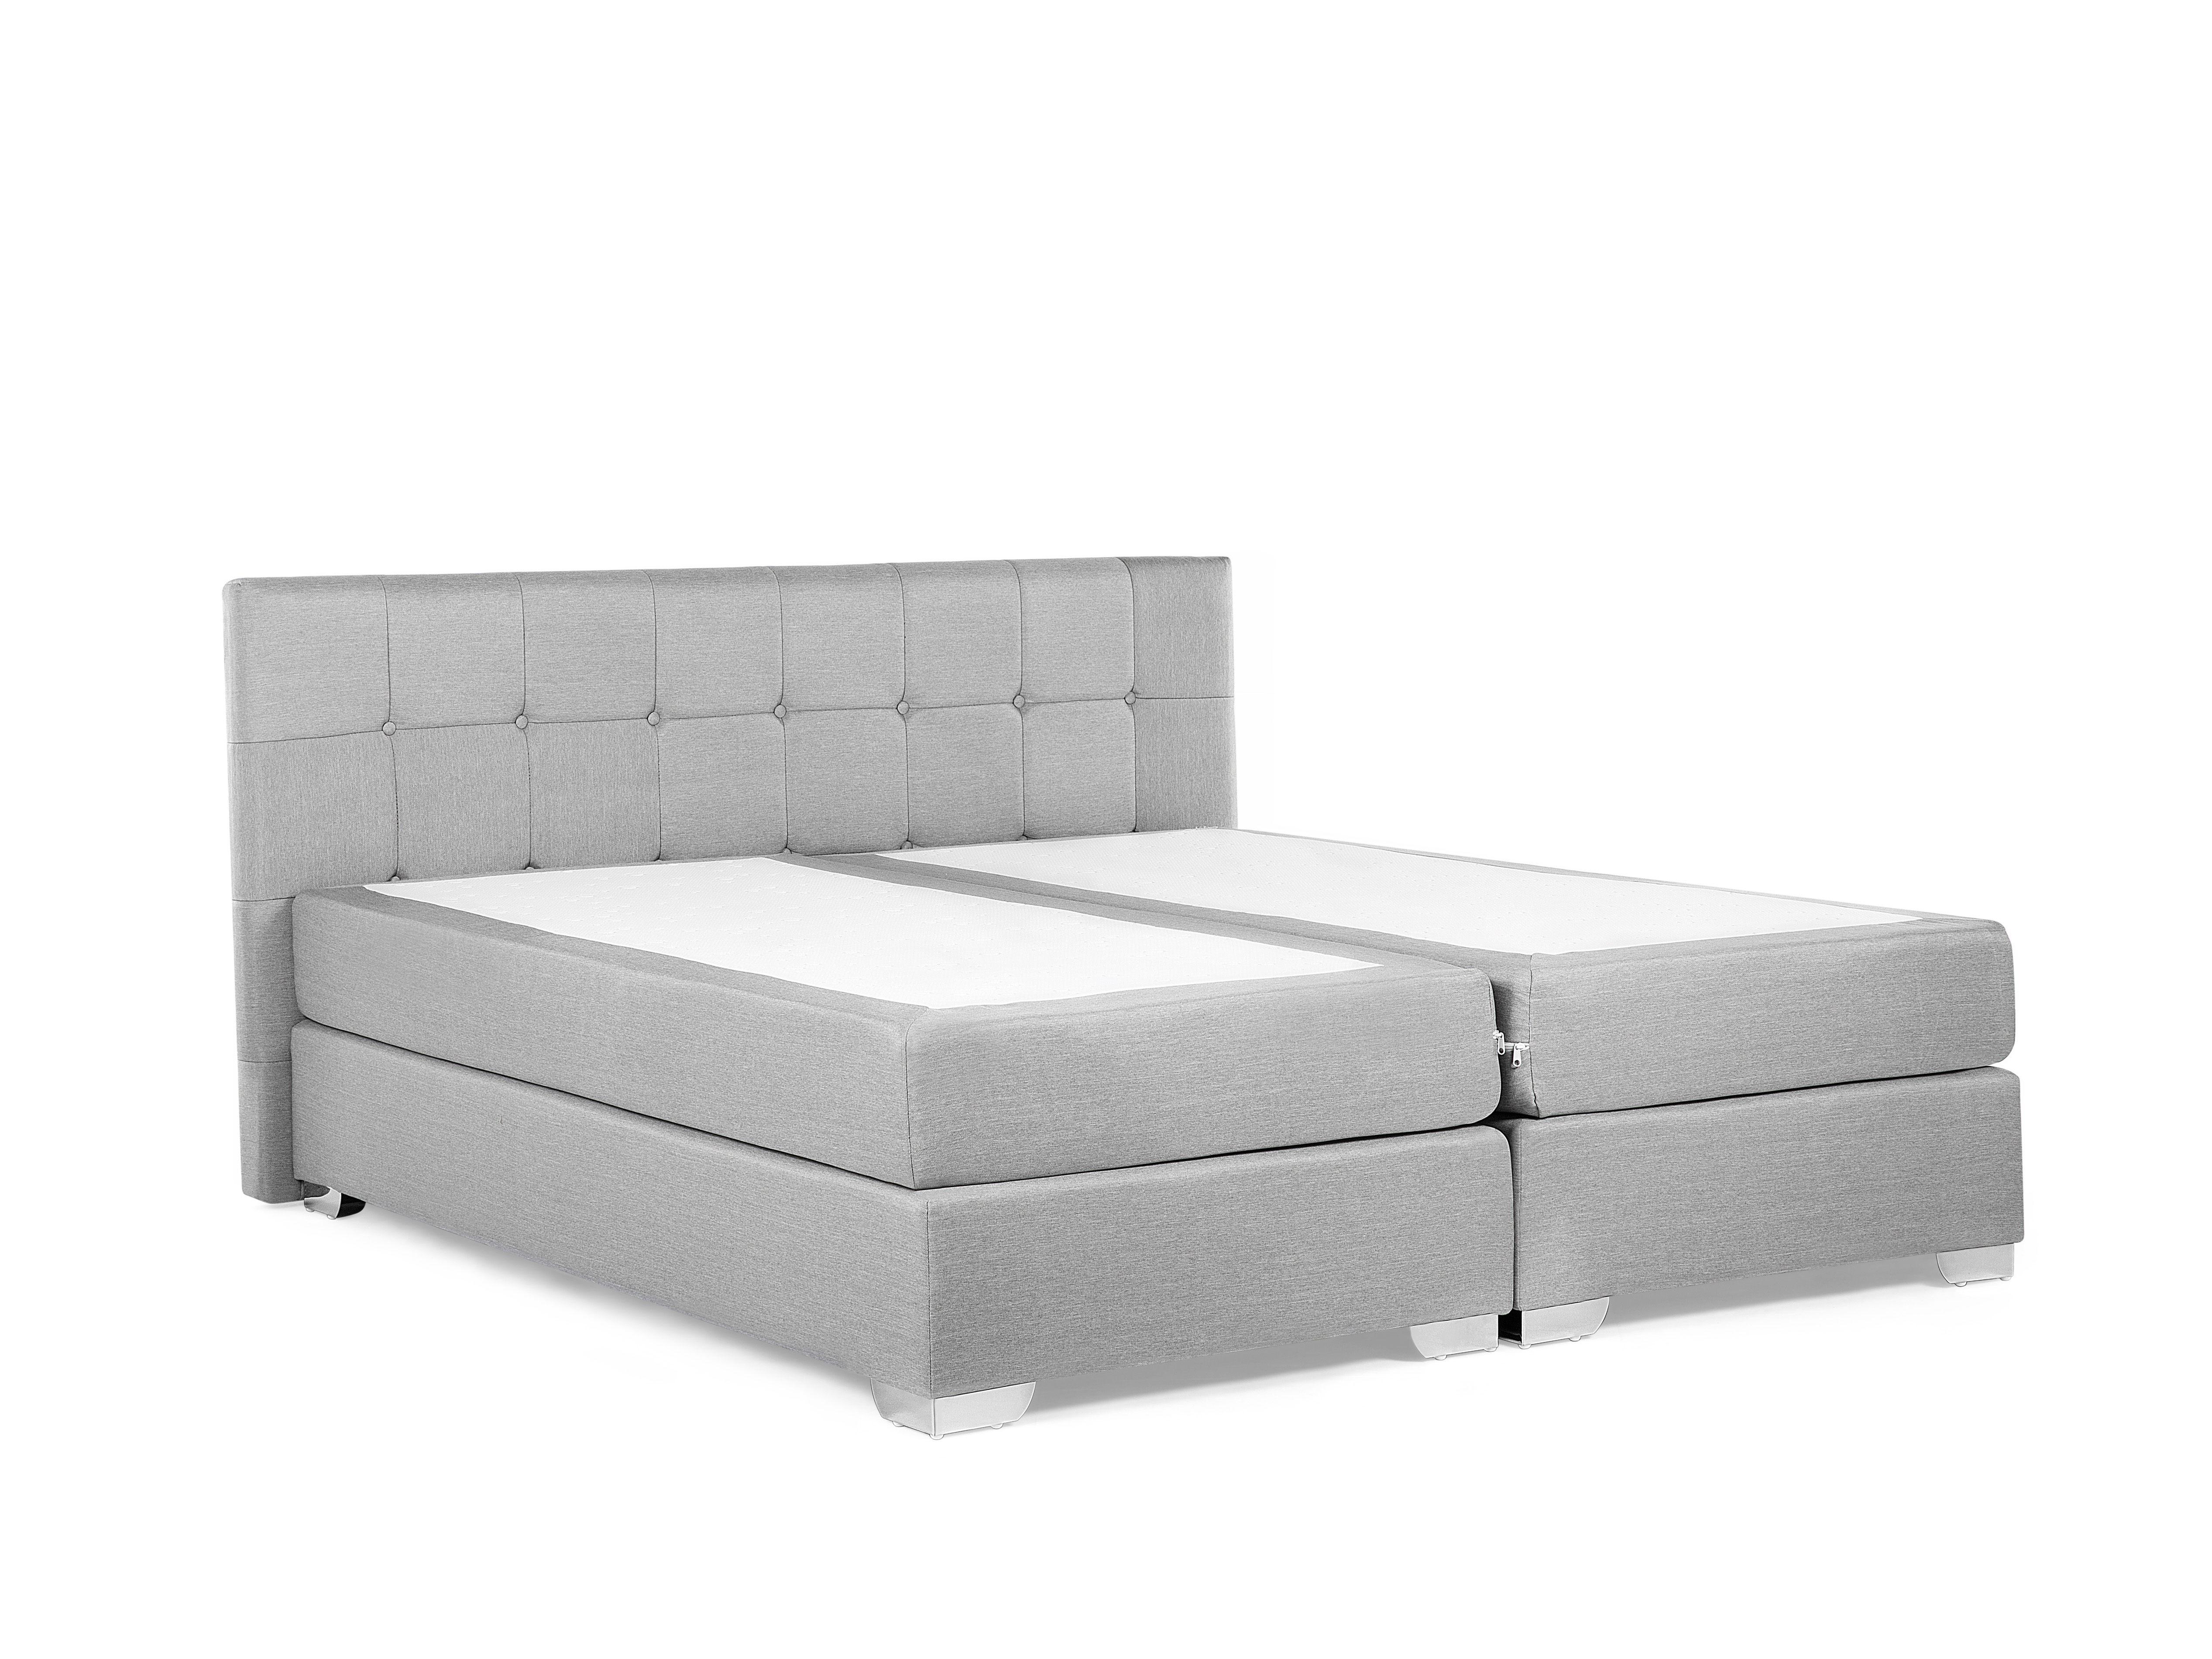 Contour De Lit 160×200 Joli Fabric King Size Divan Bed Light Grey Admiral